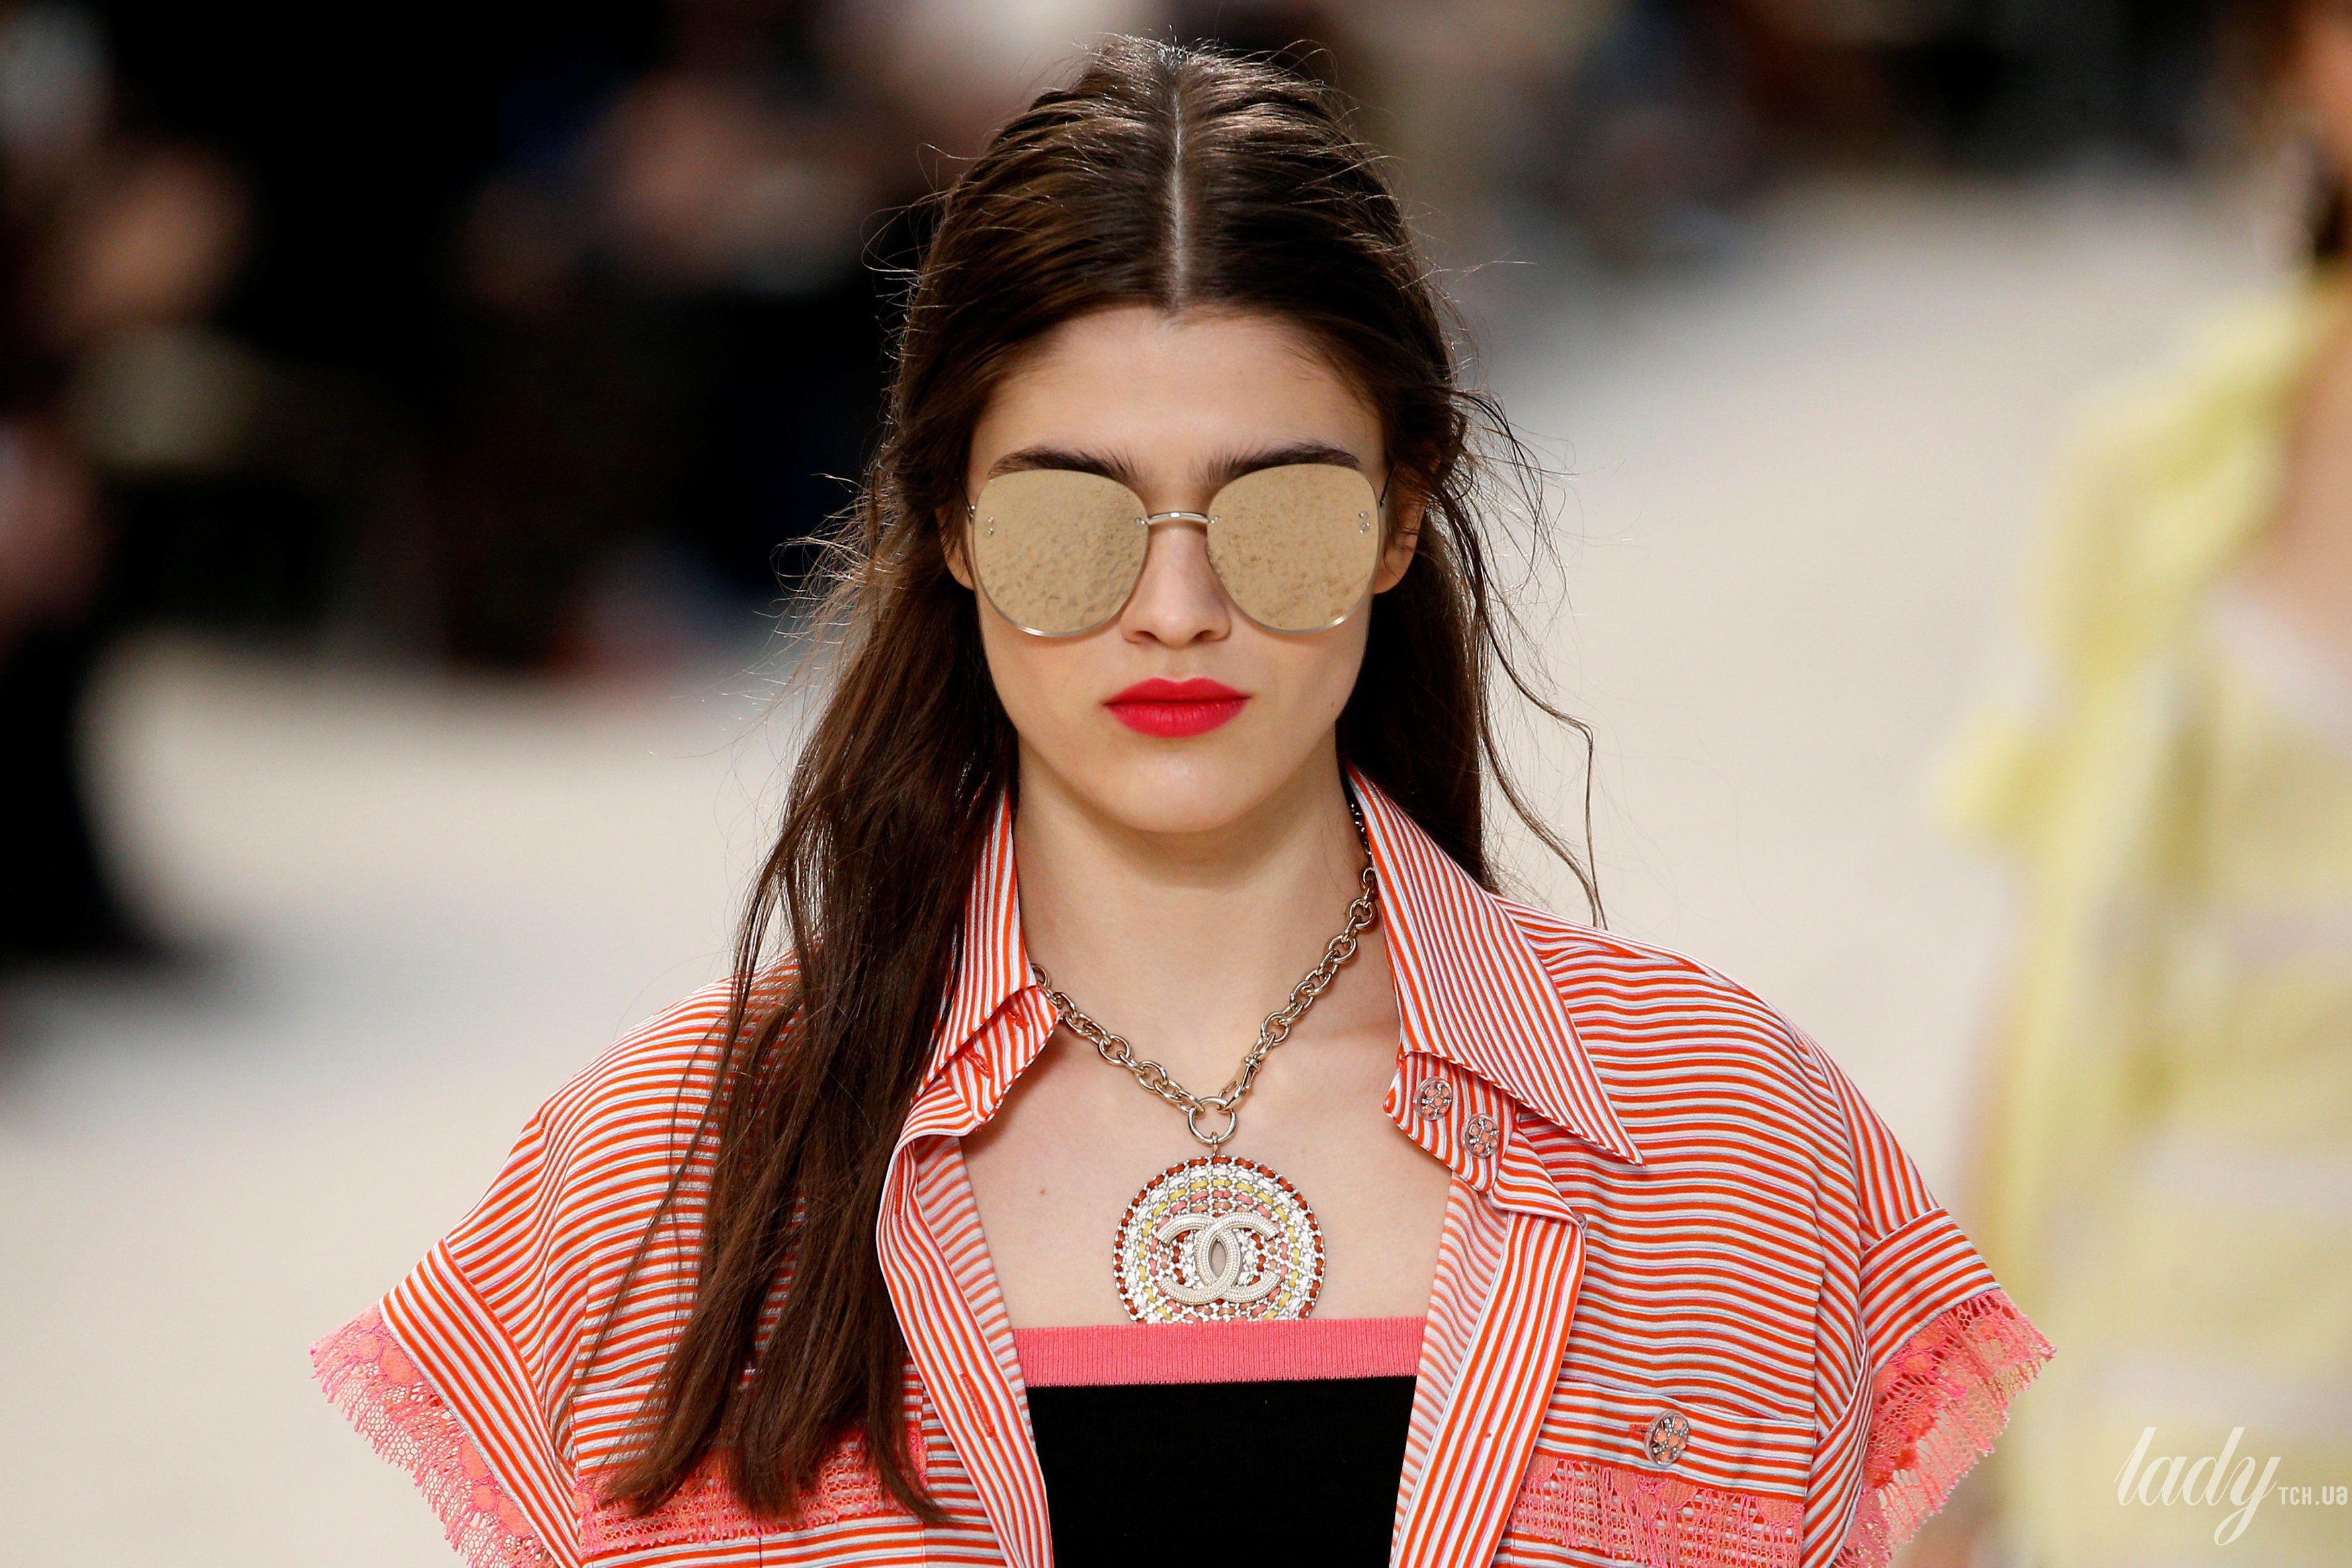 Коллекция Chanel прет-а-порте сезона весна-лето 2019_29